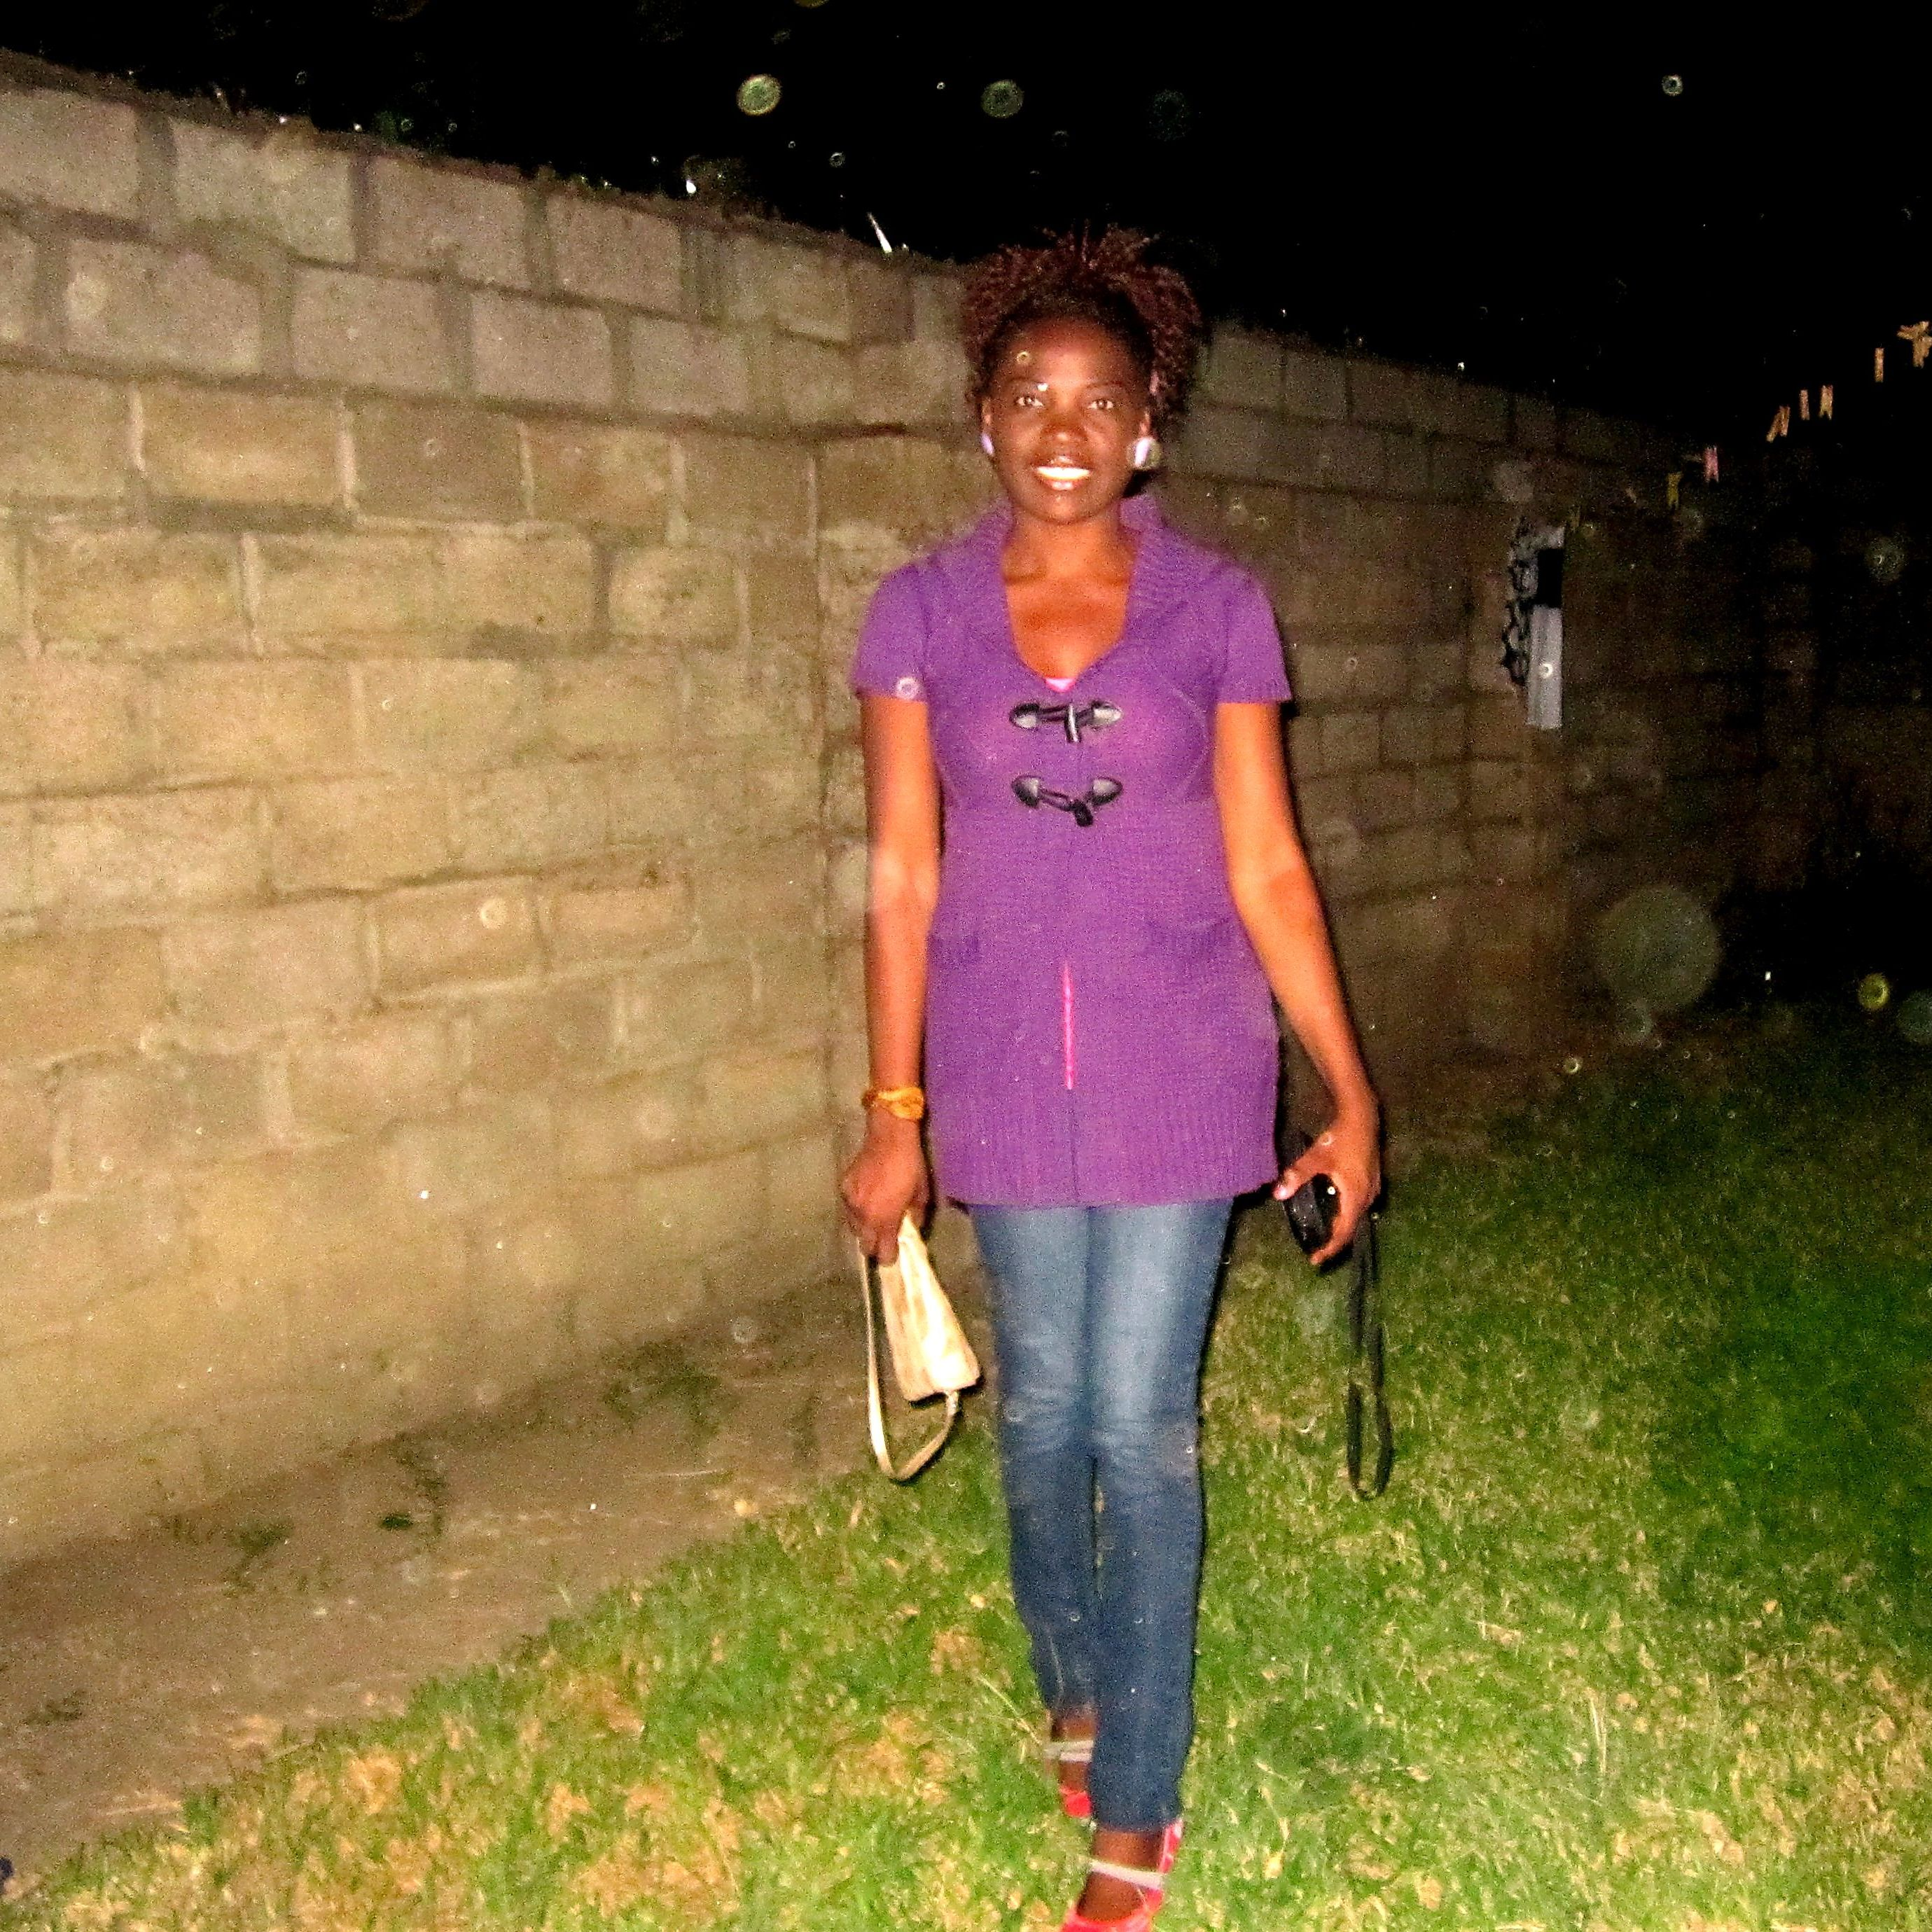 Readith Mwila Muliyunda